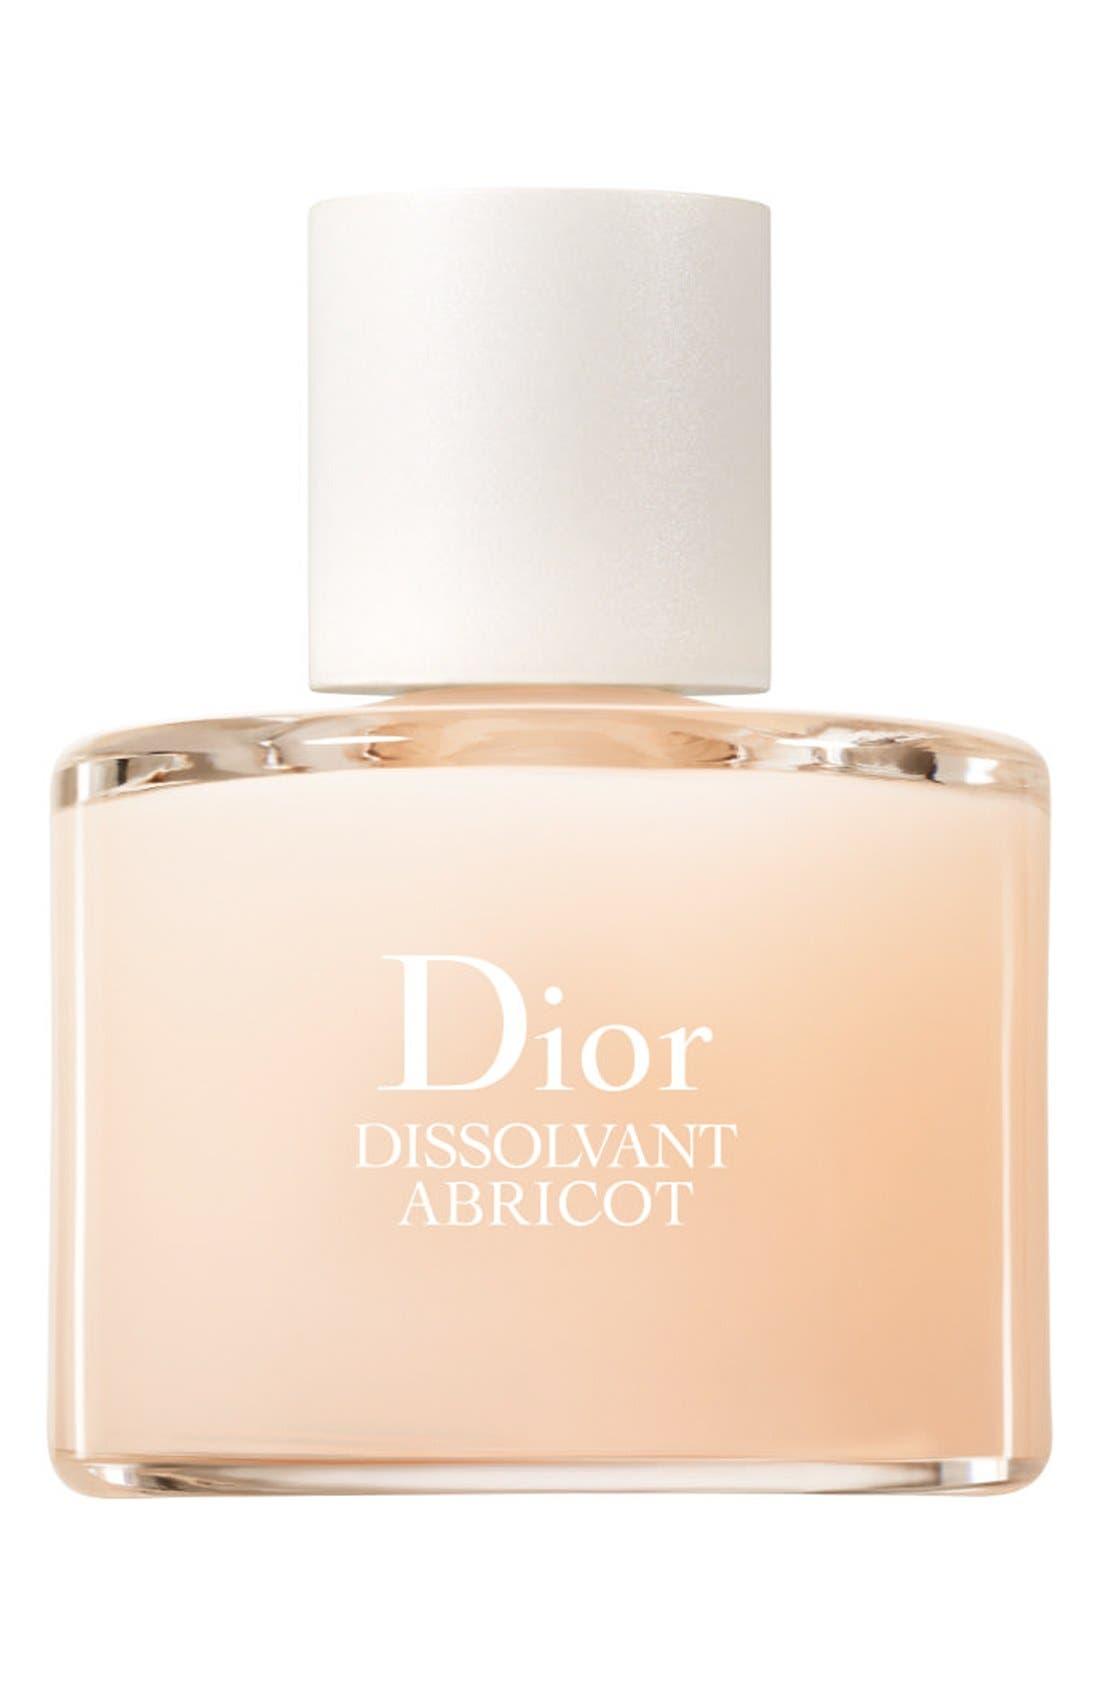 'Dissolvant Abricot' Nail Polish Remover,                         Main,                         color, 000